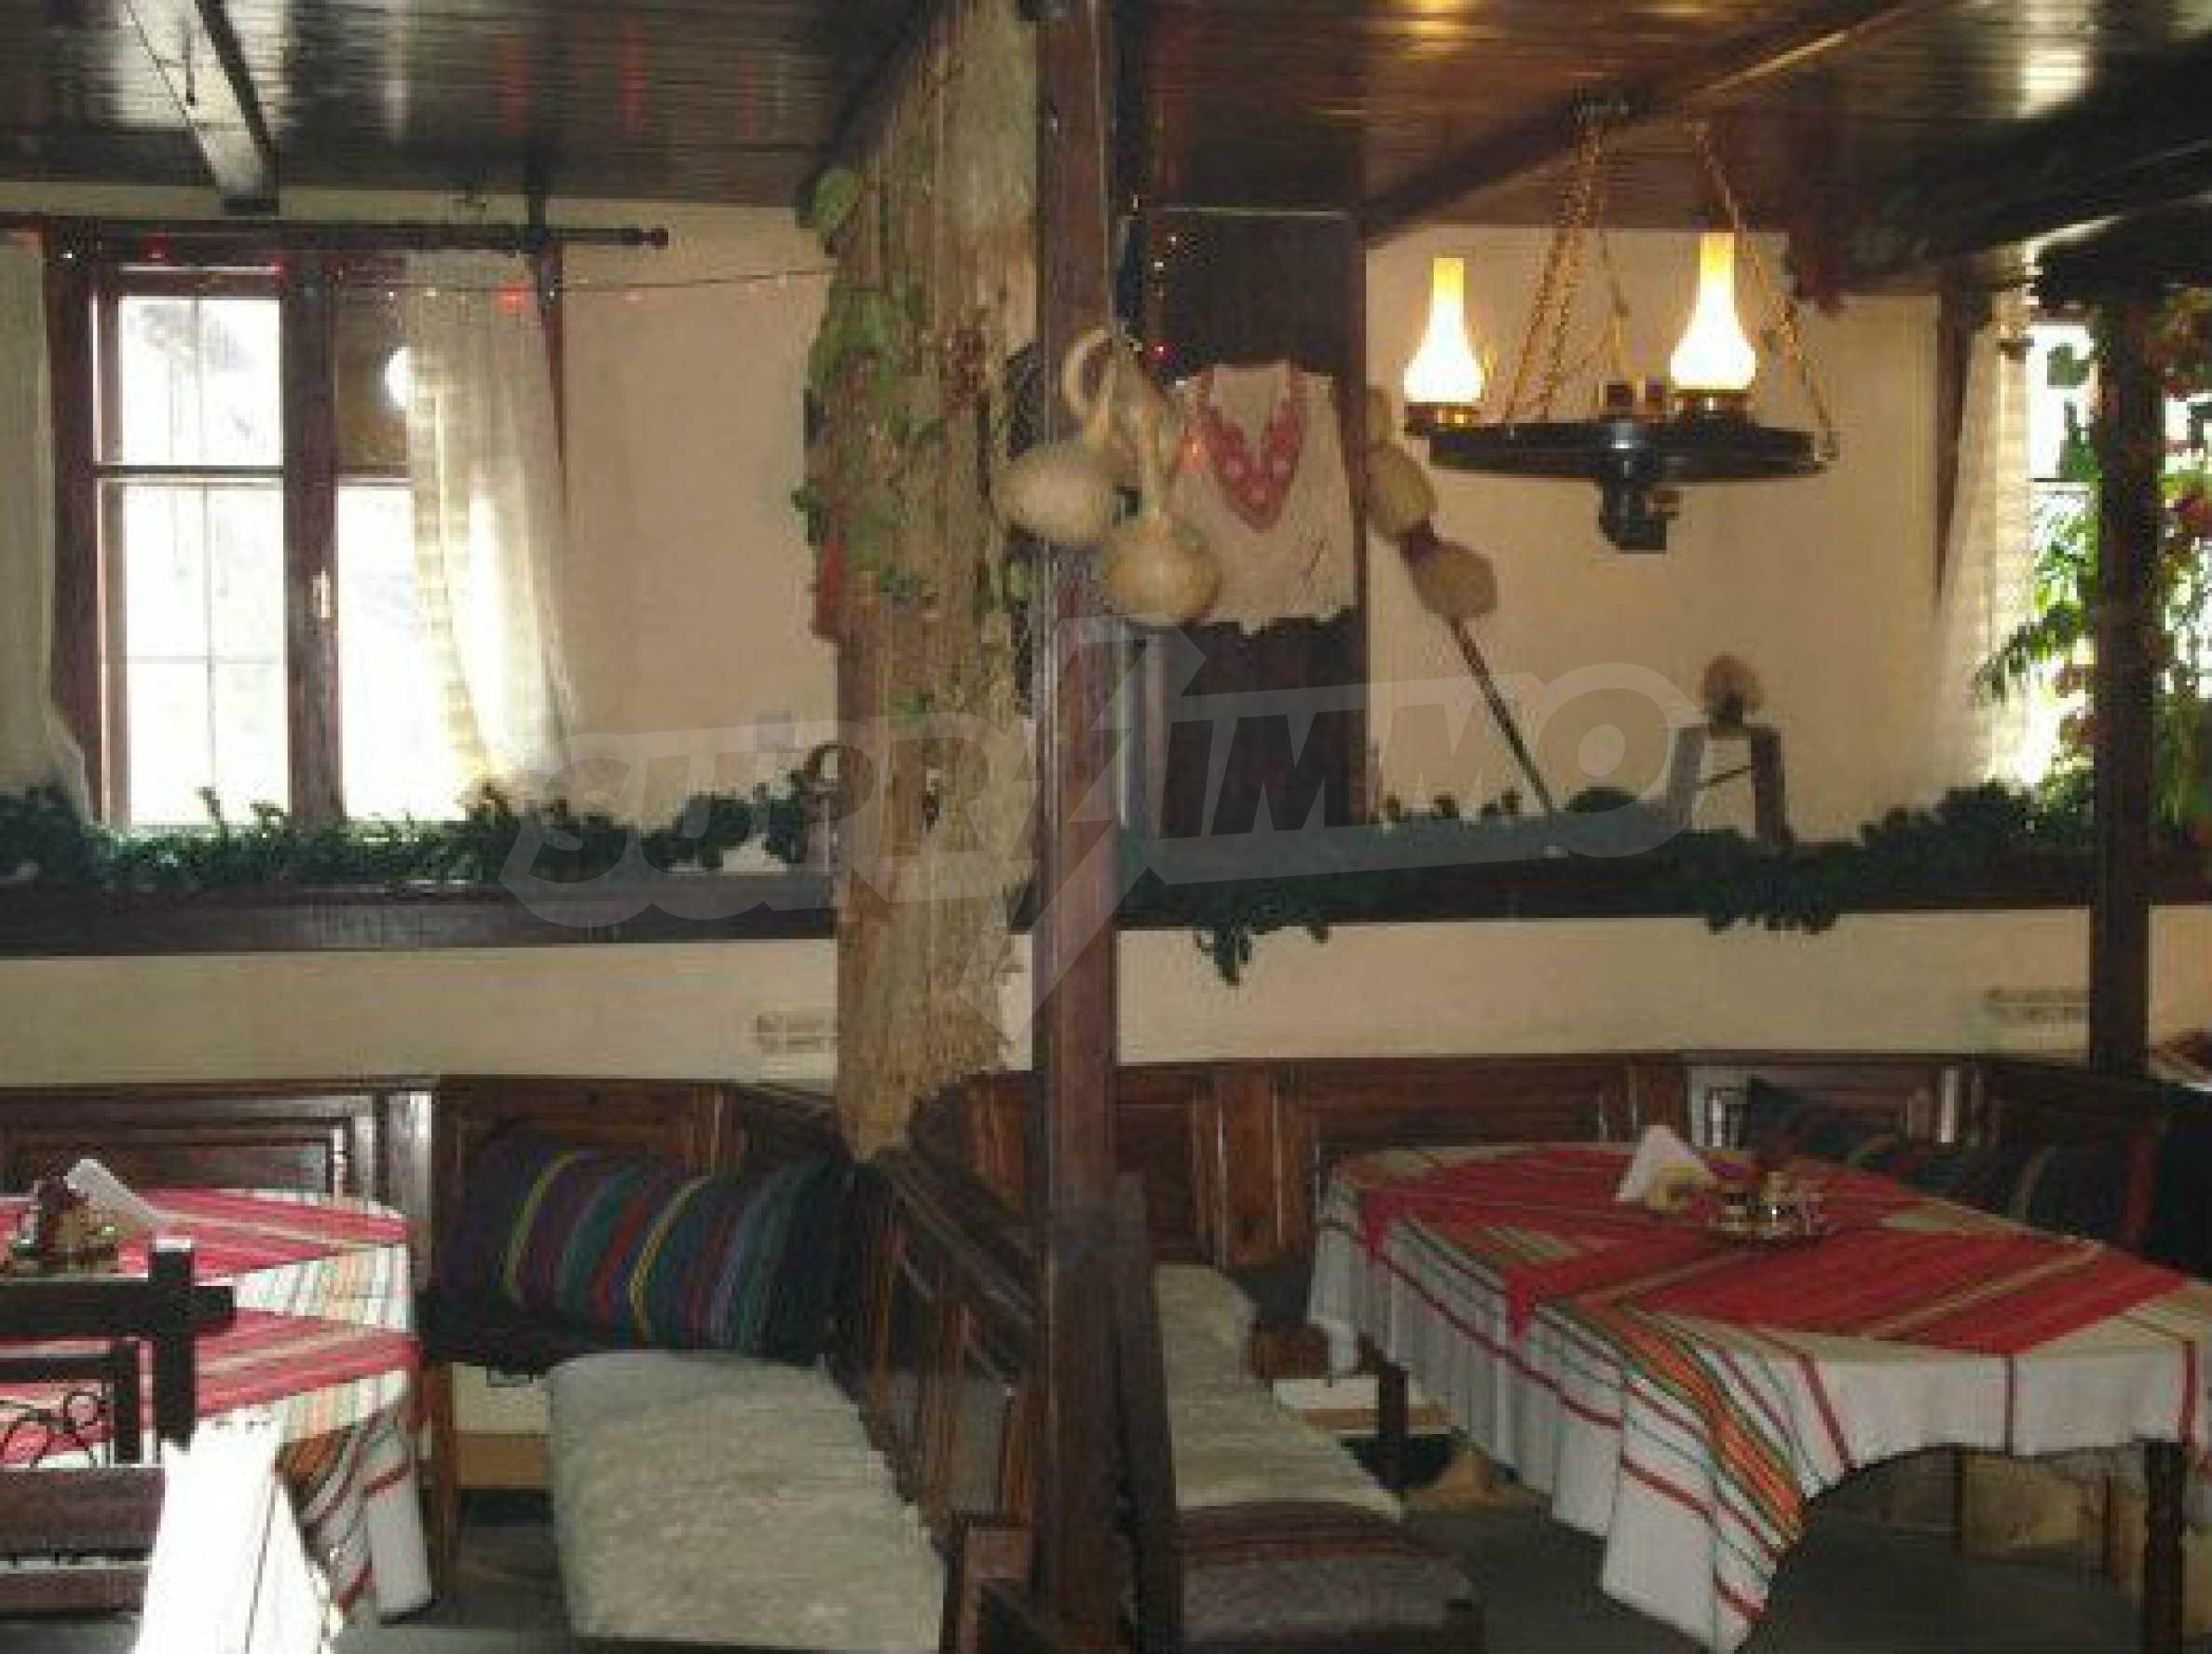 Hotelanlage mit Restaurant am Ufer des Flusses Osam in Lovech 48